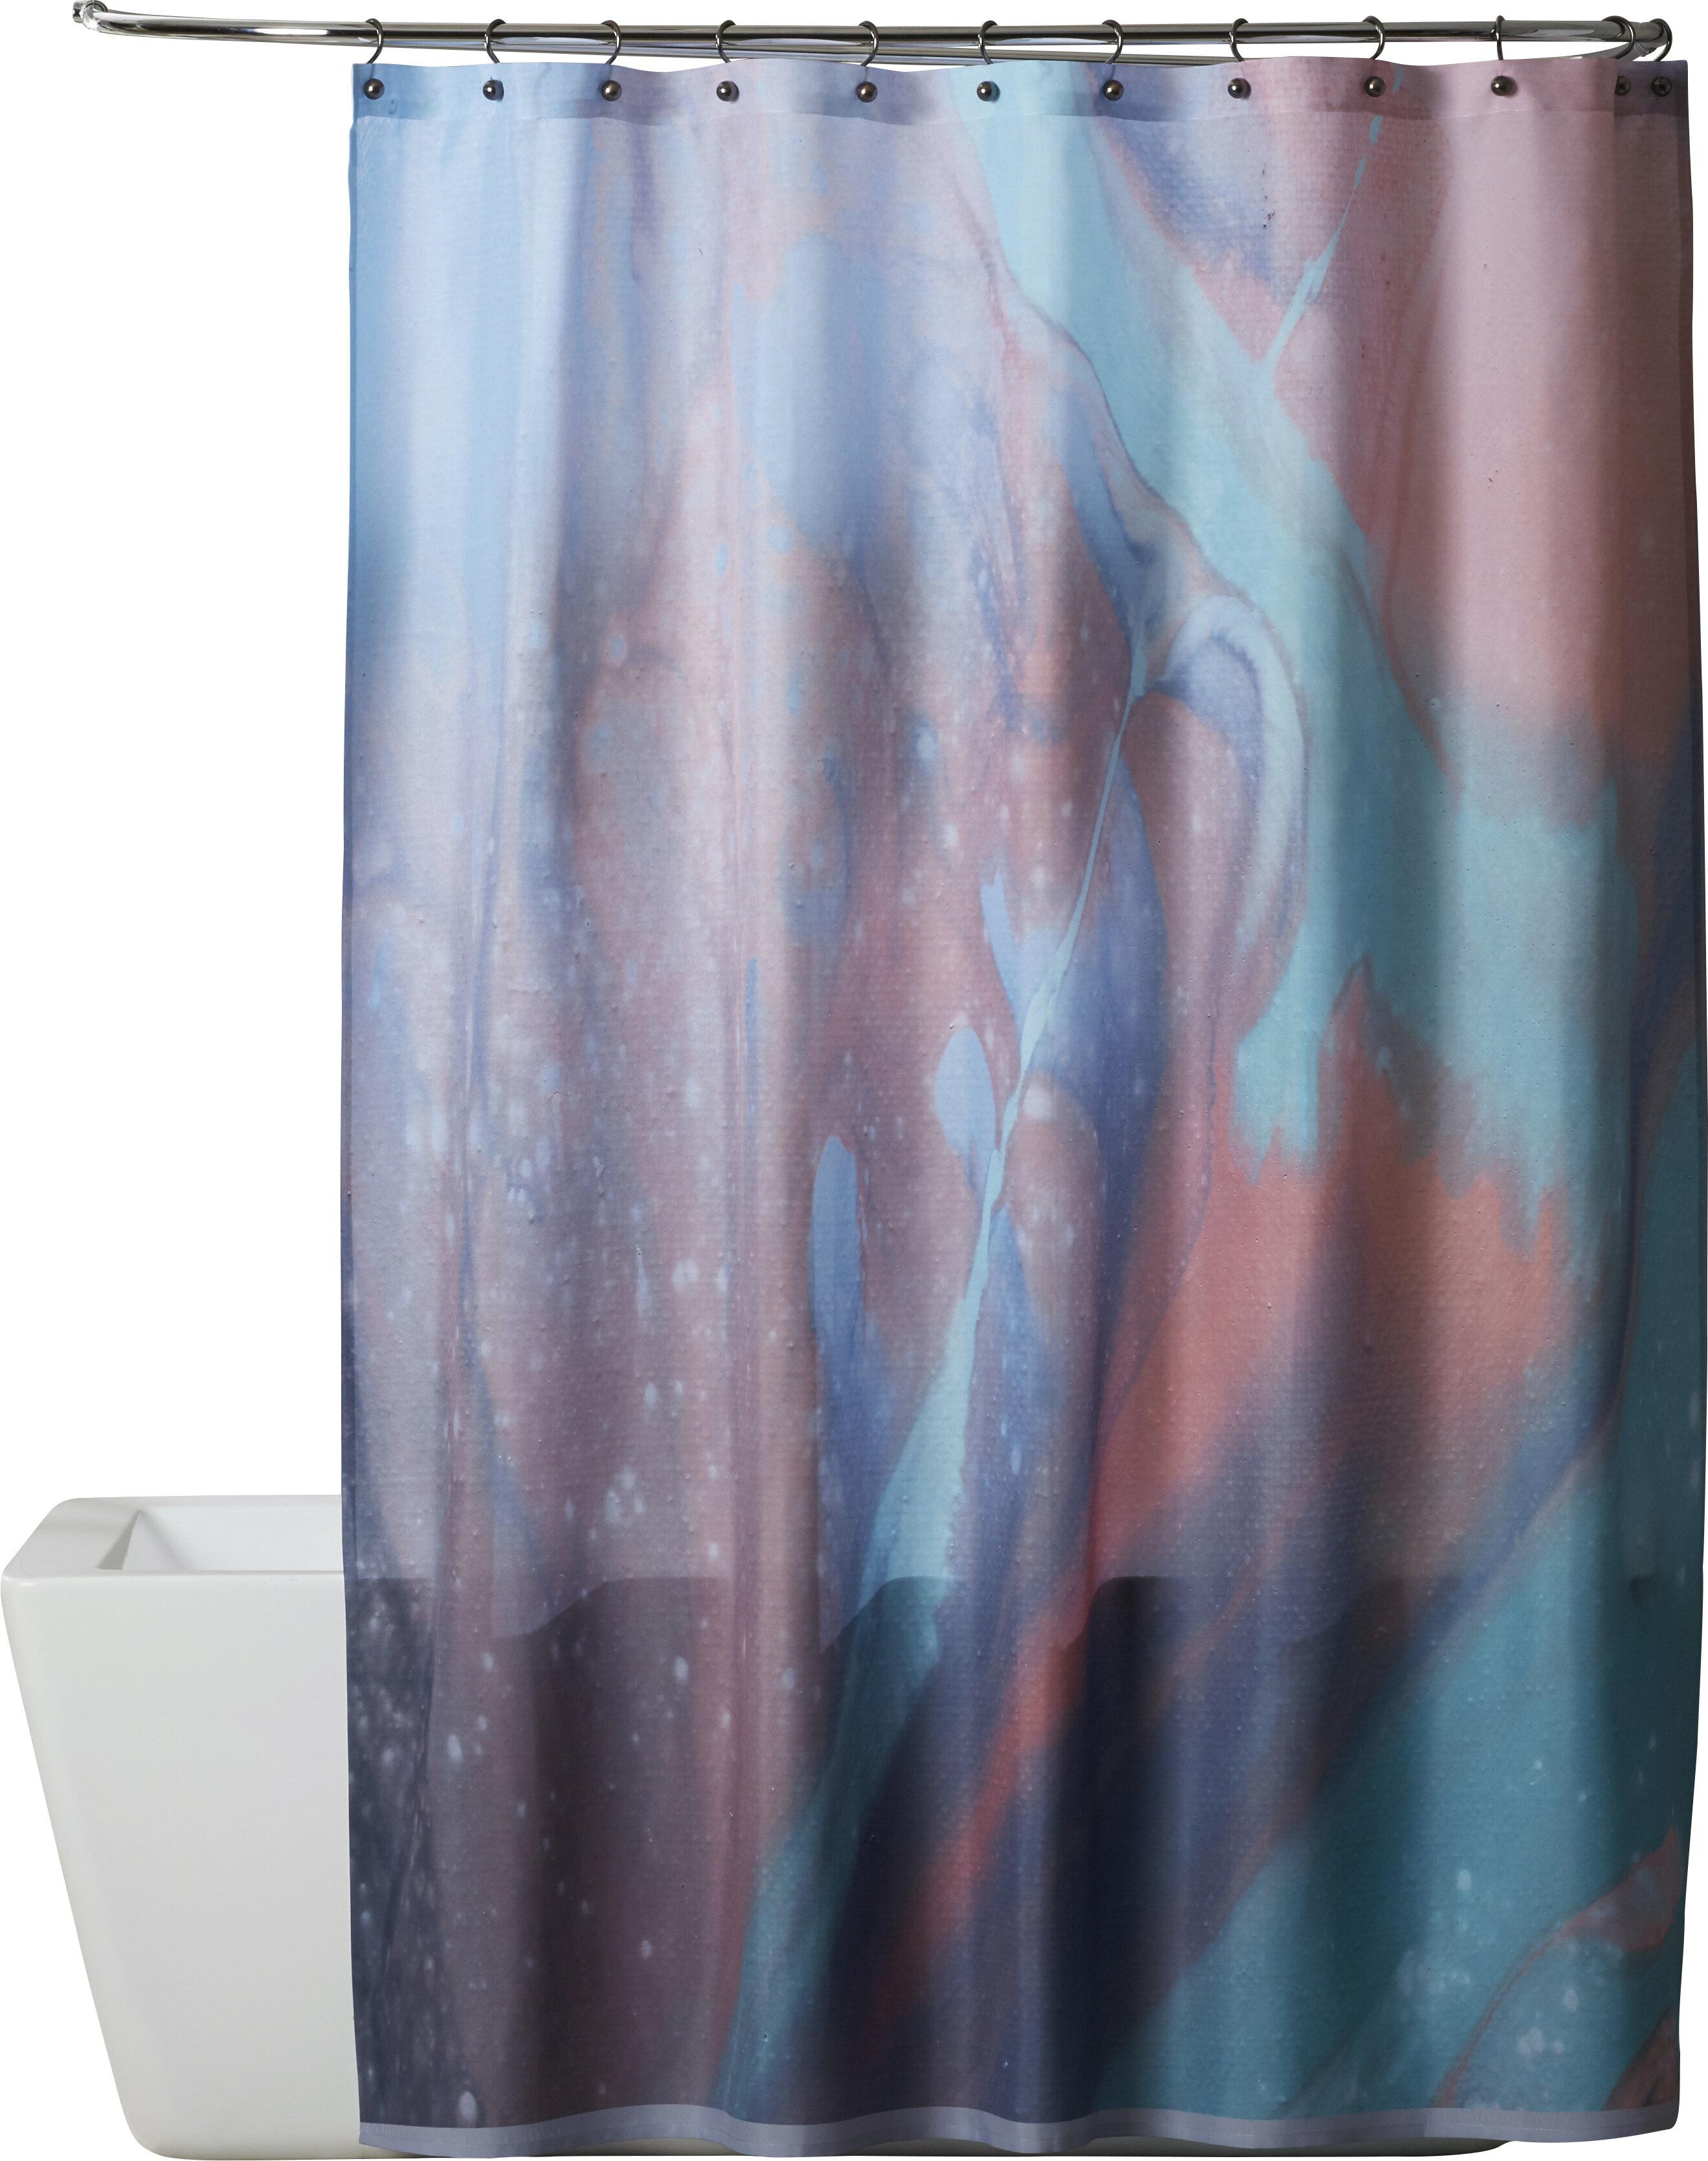 Brayden Studio Deb Mcnaughton In The Ocean Single Shower Curtain Wayfair